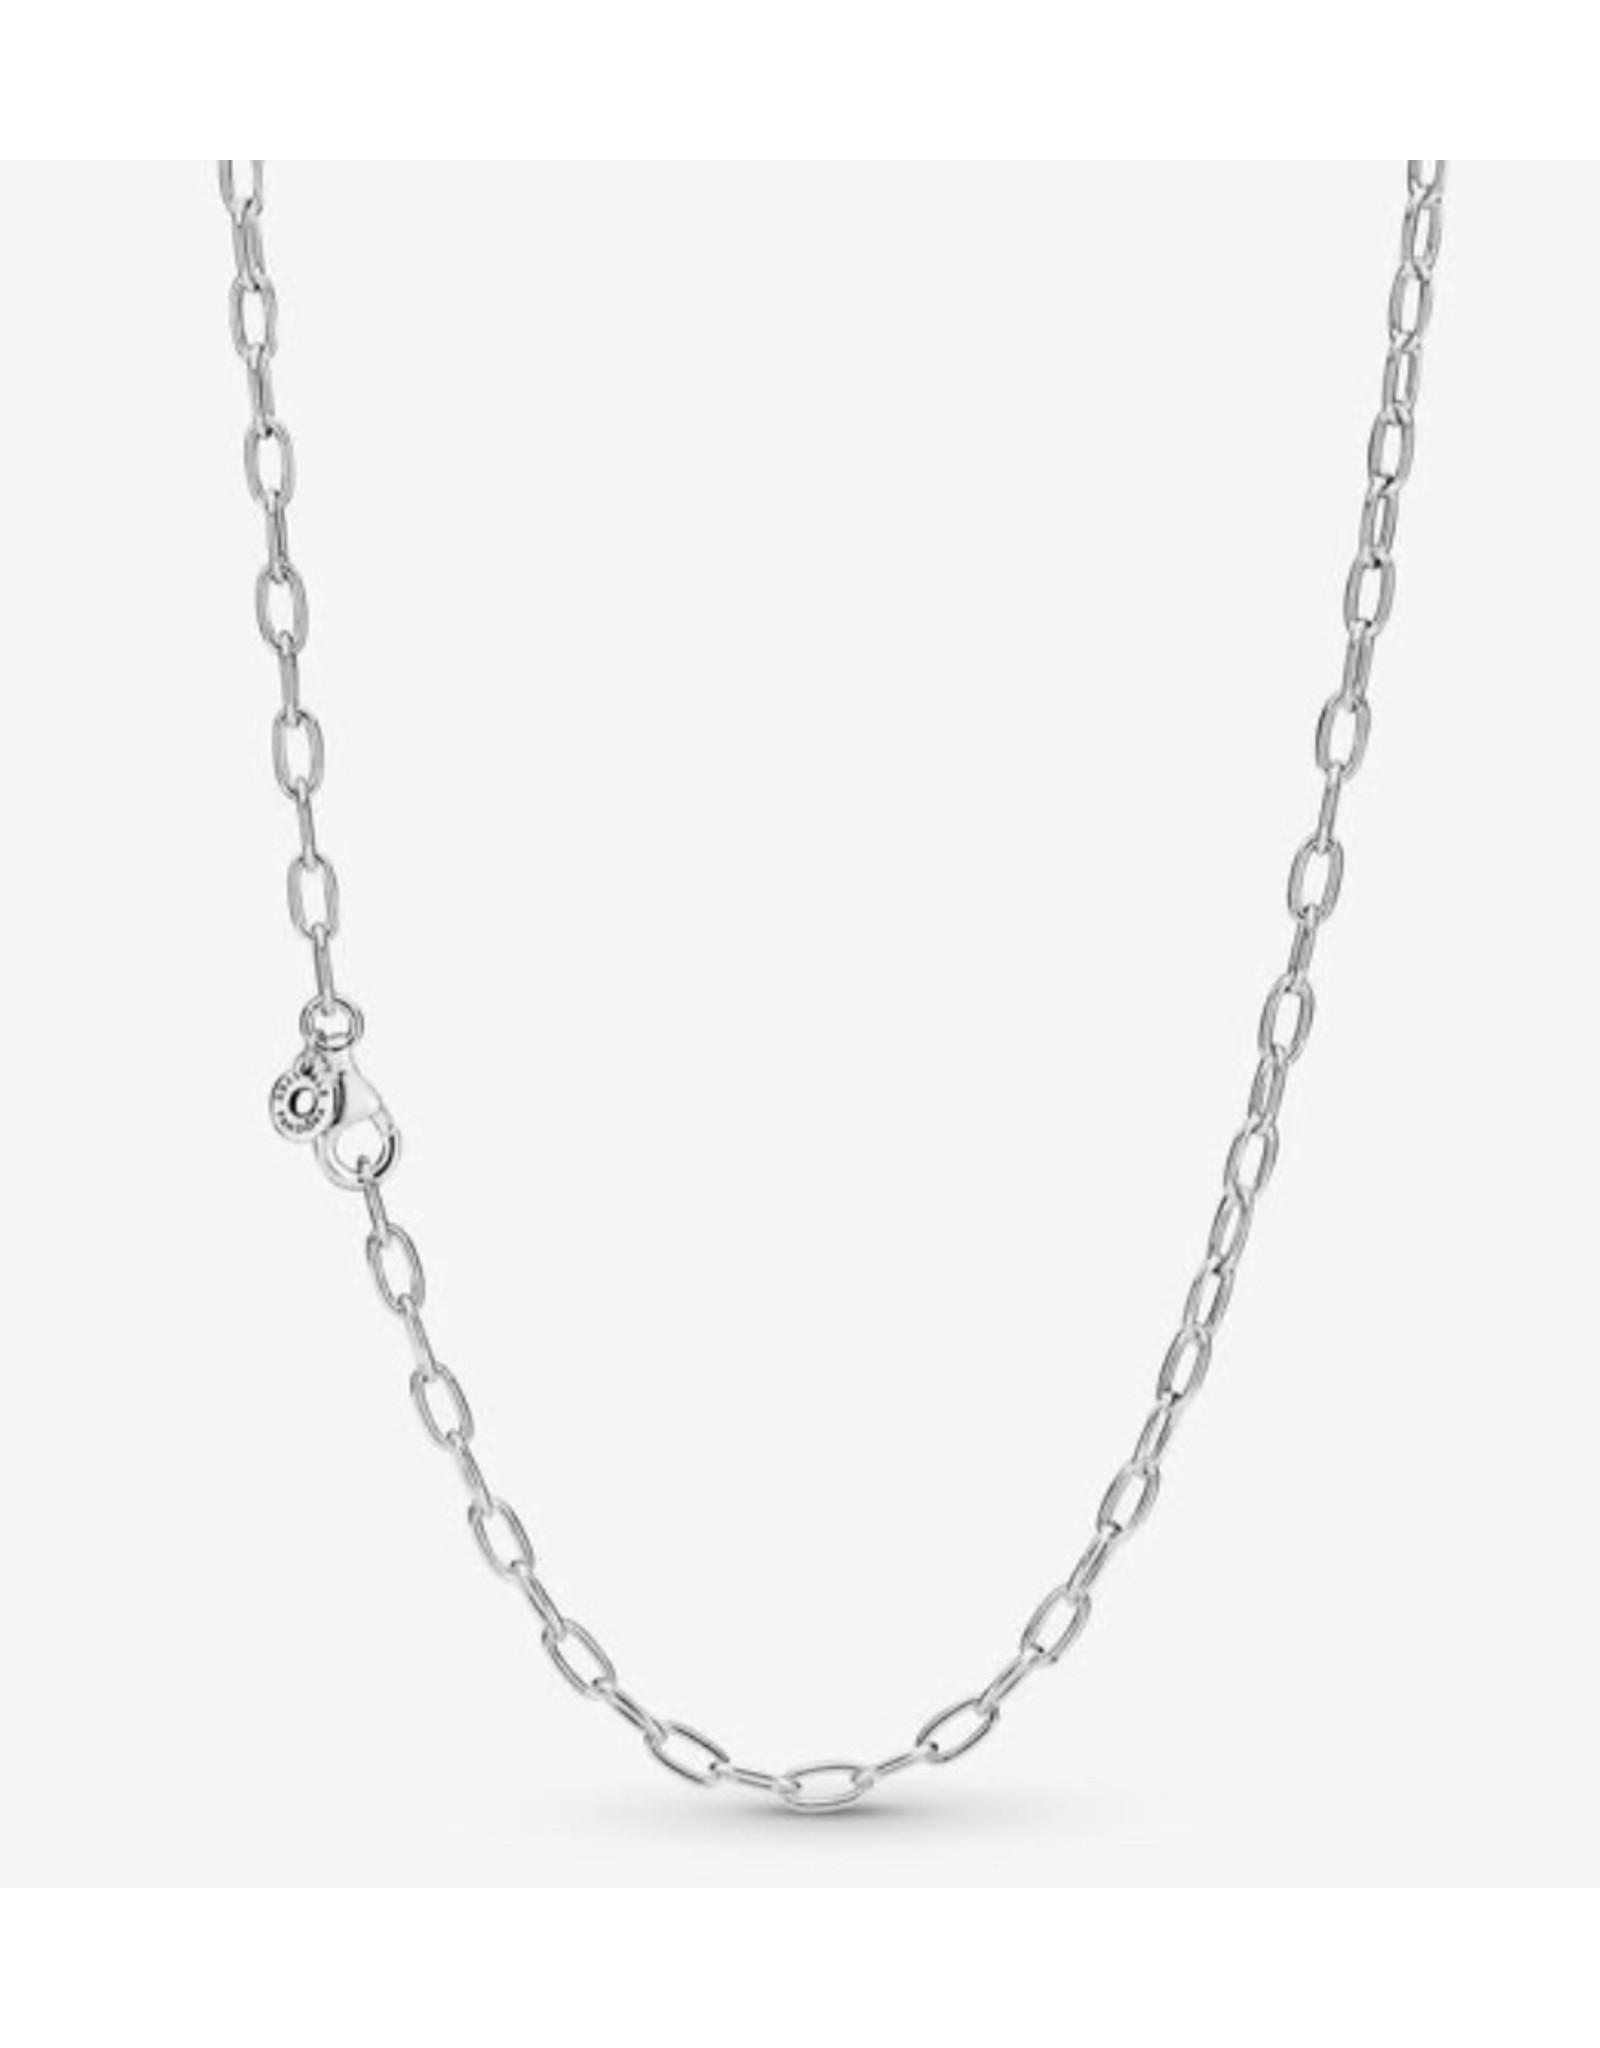 Pandora Pandora Chain,399410C00-50, Link Chain Necklace